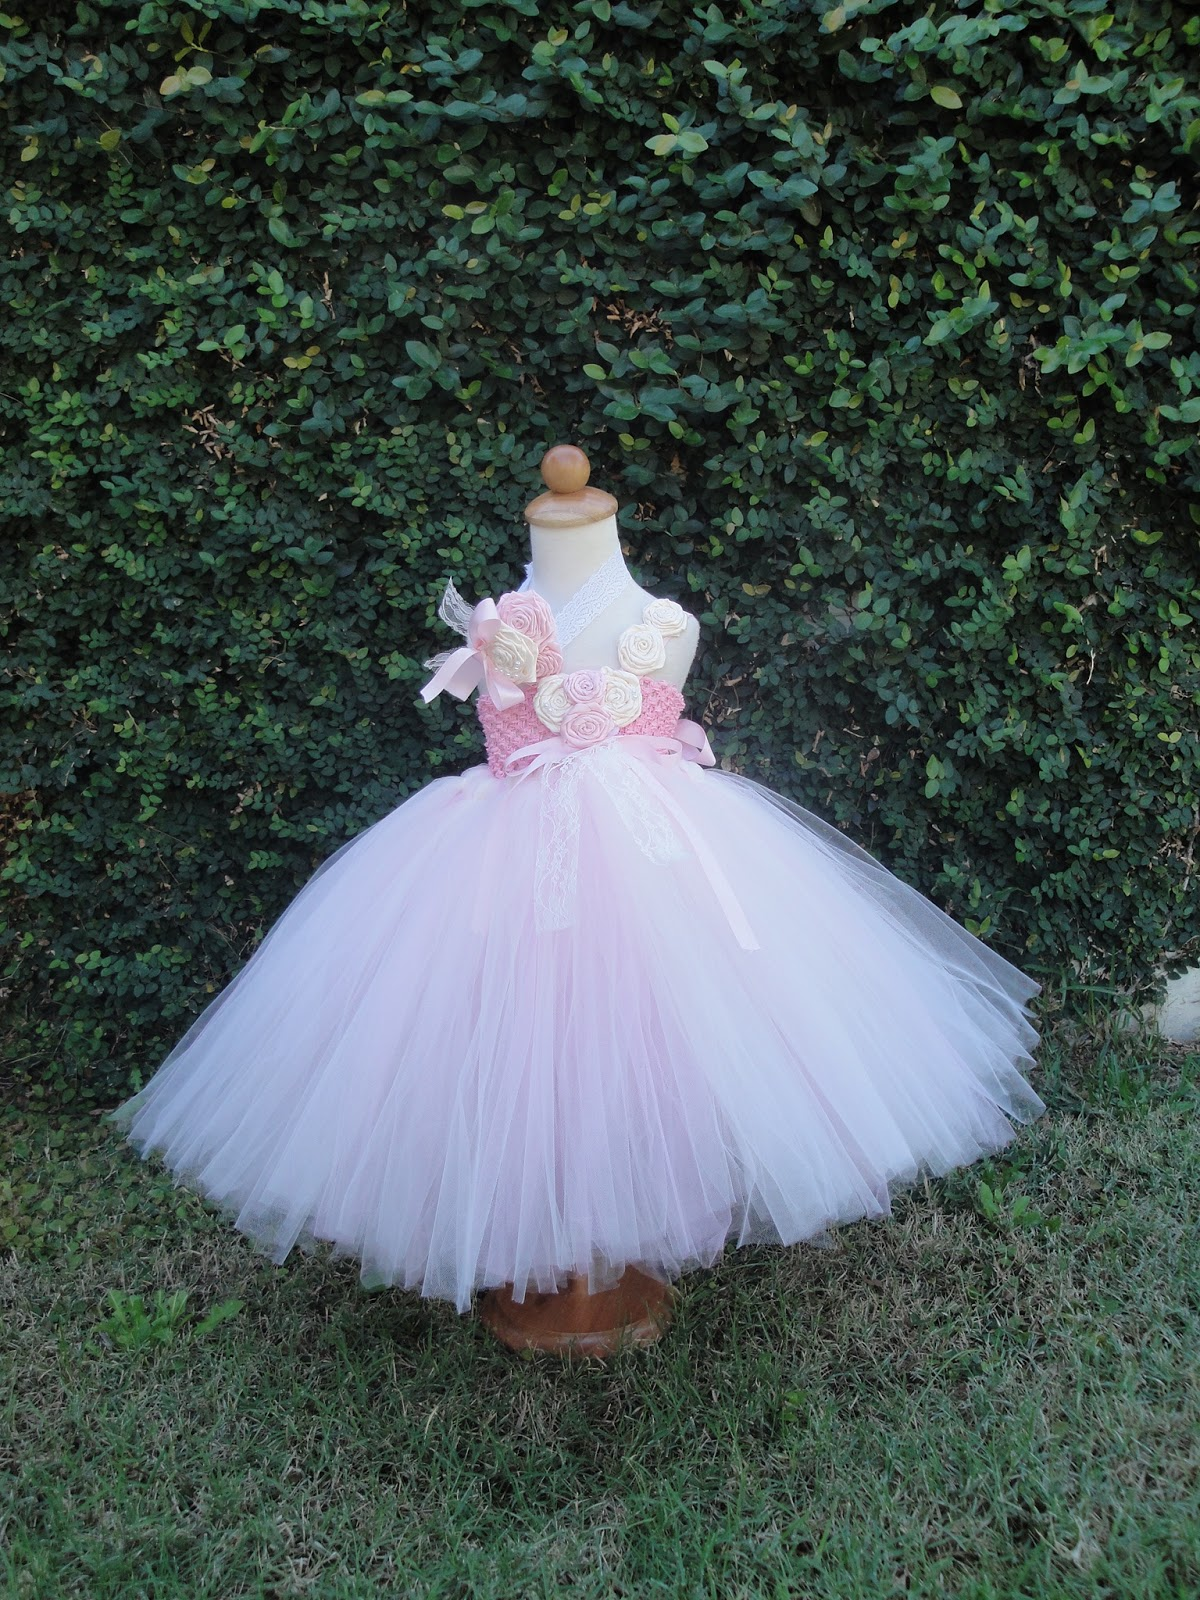 vintage baby wedding dress baby wedding dresses Vintage wedding baby flower girl tutu dress